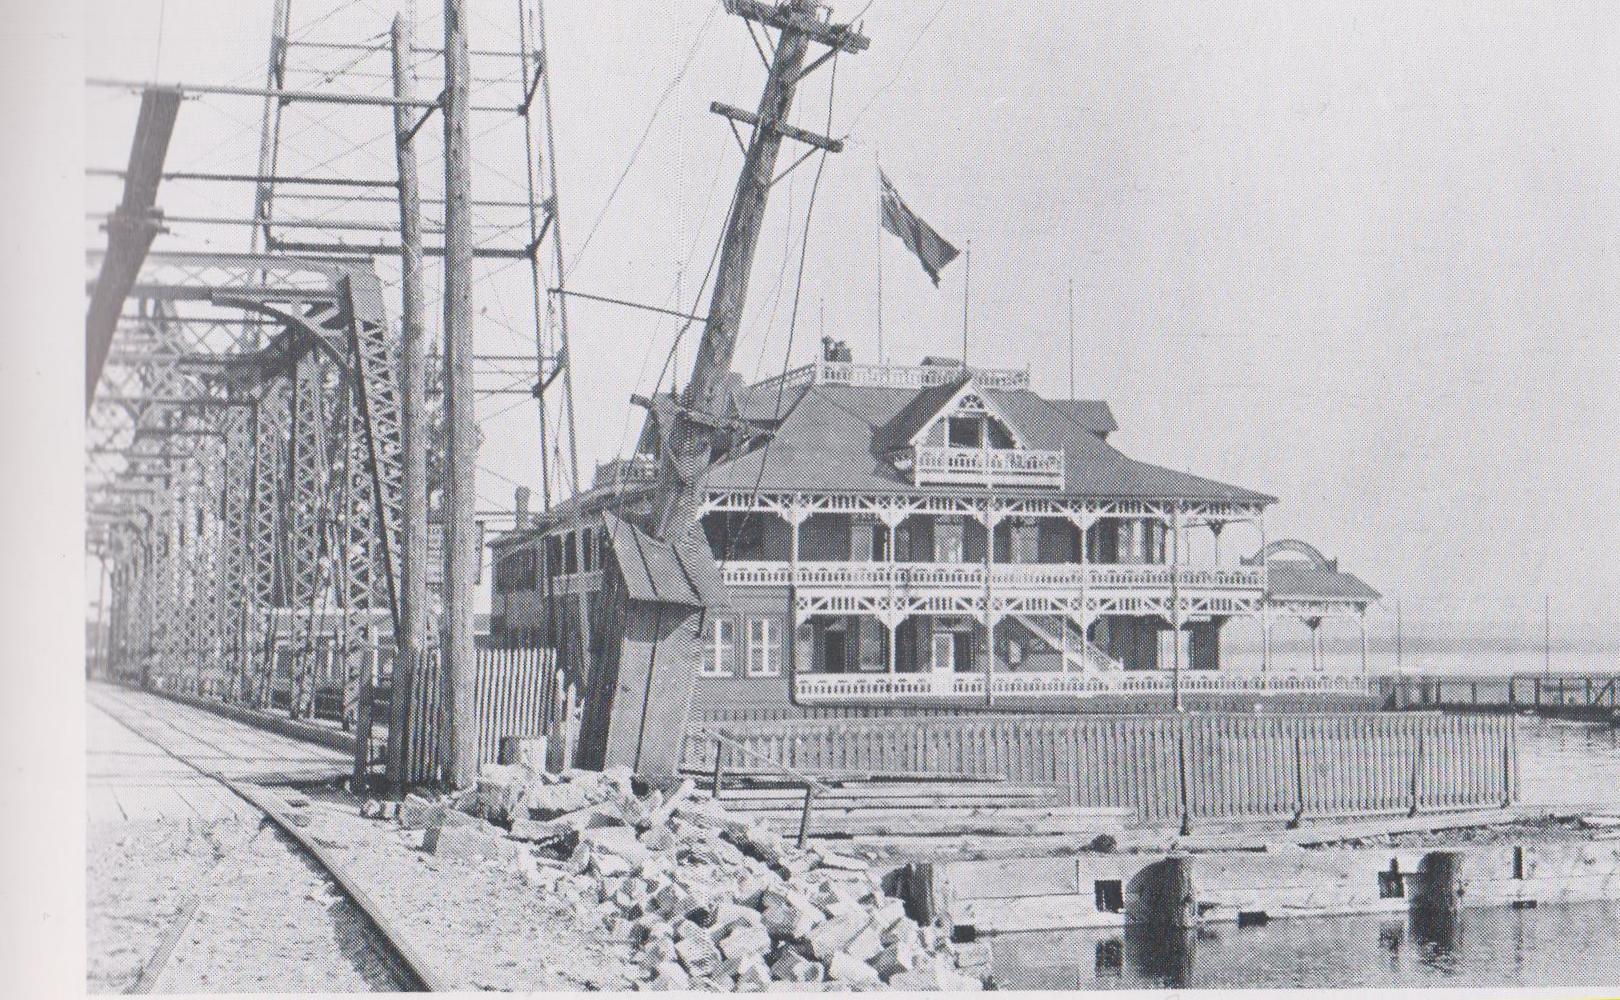 yacht club-1891-1915.jpg